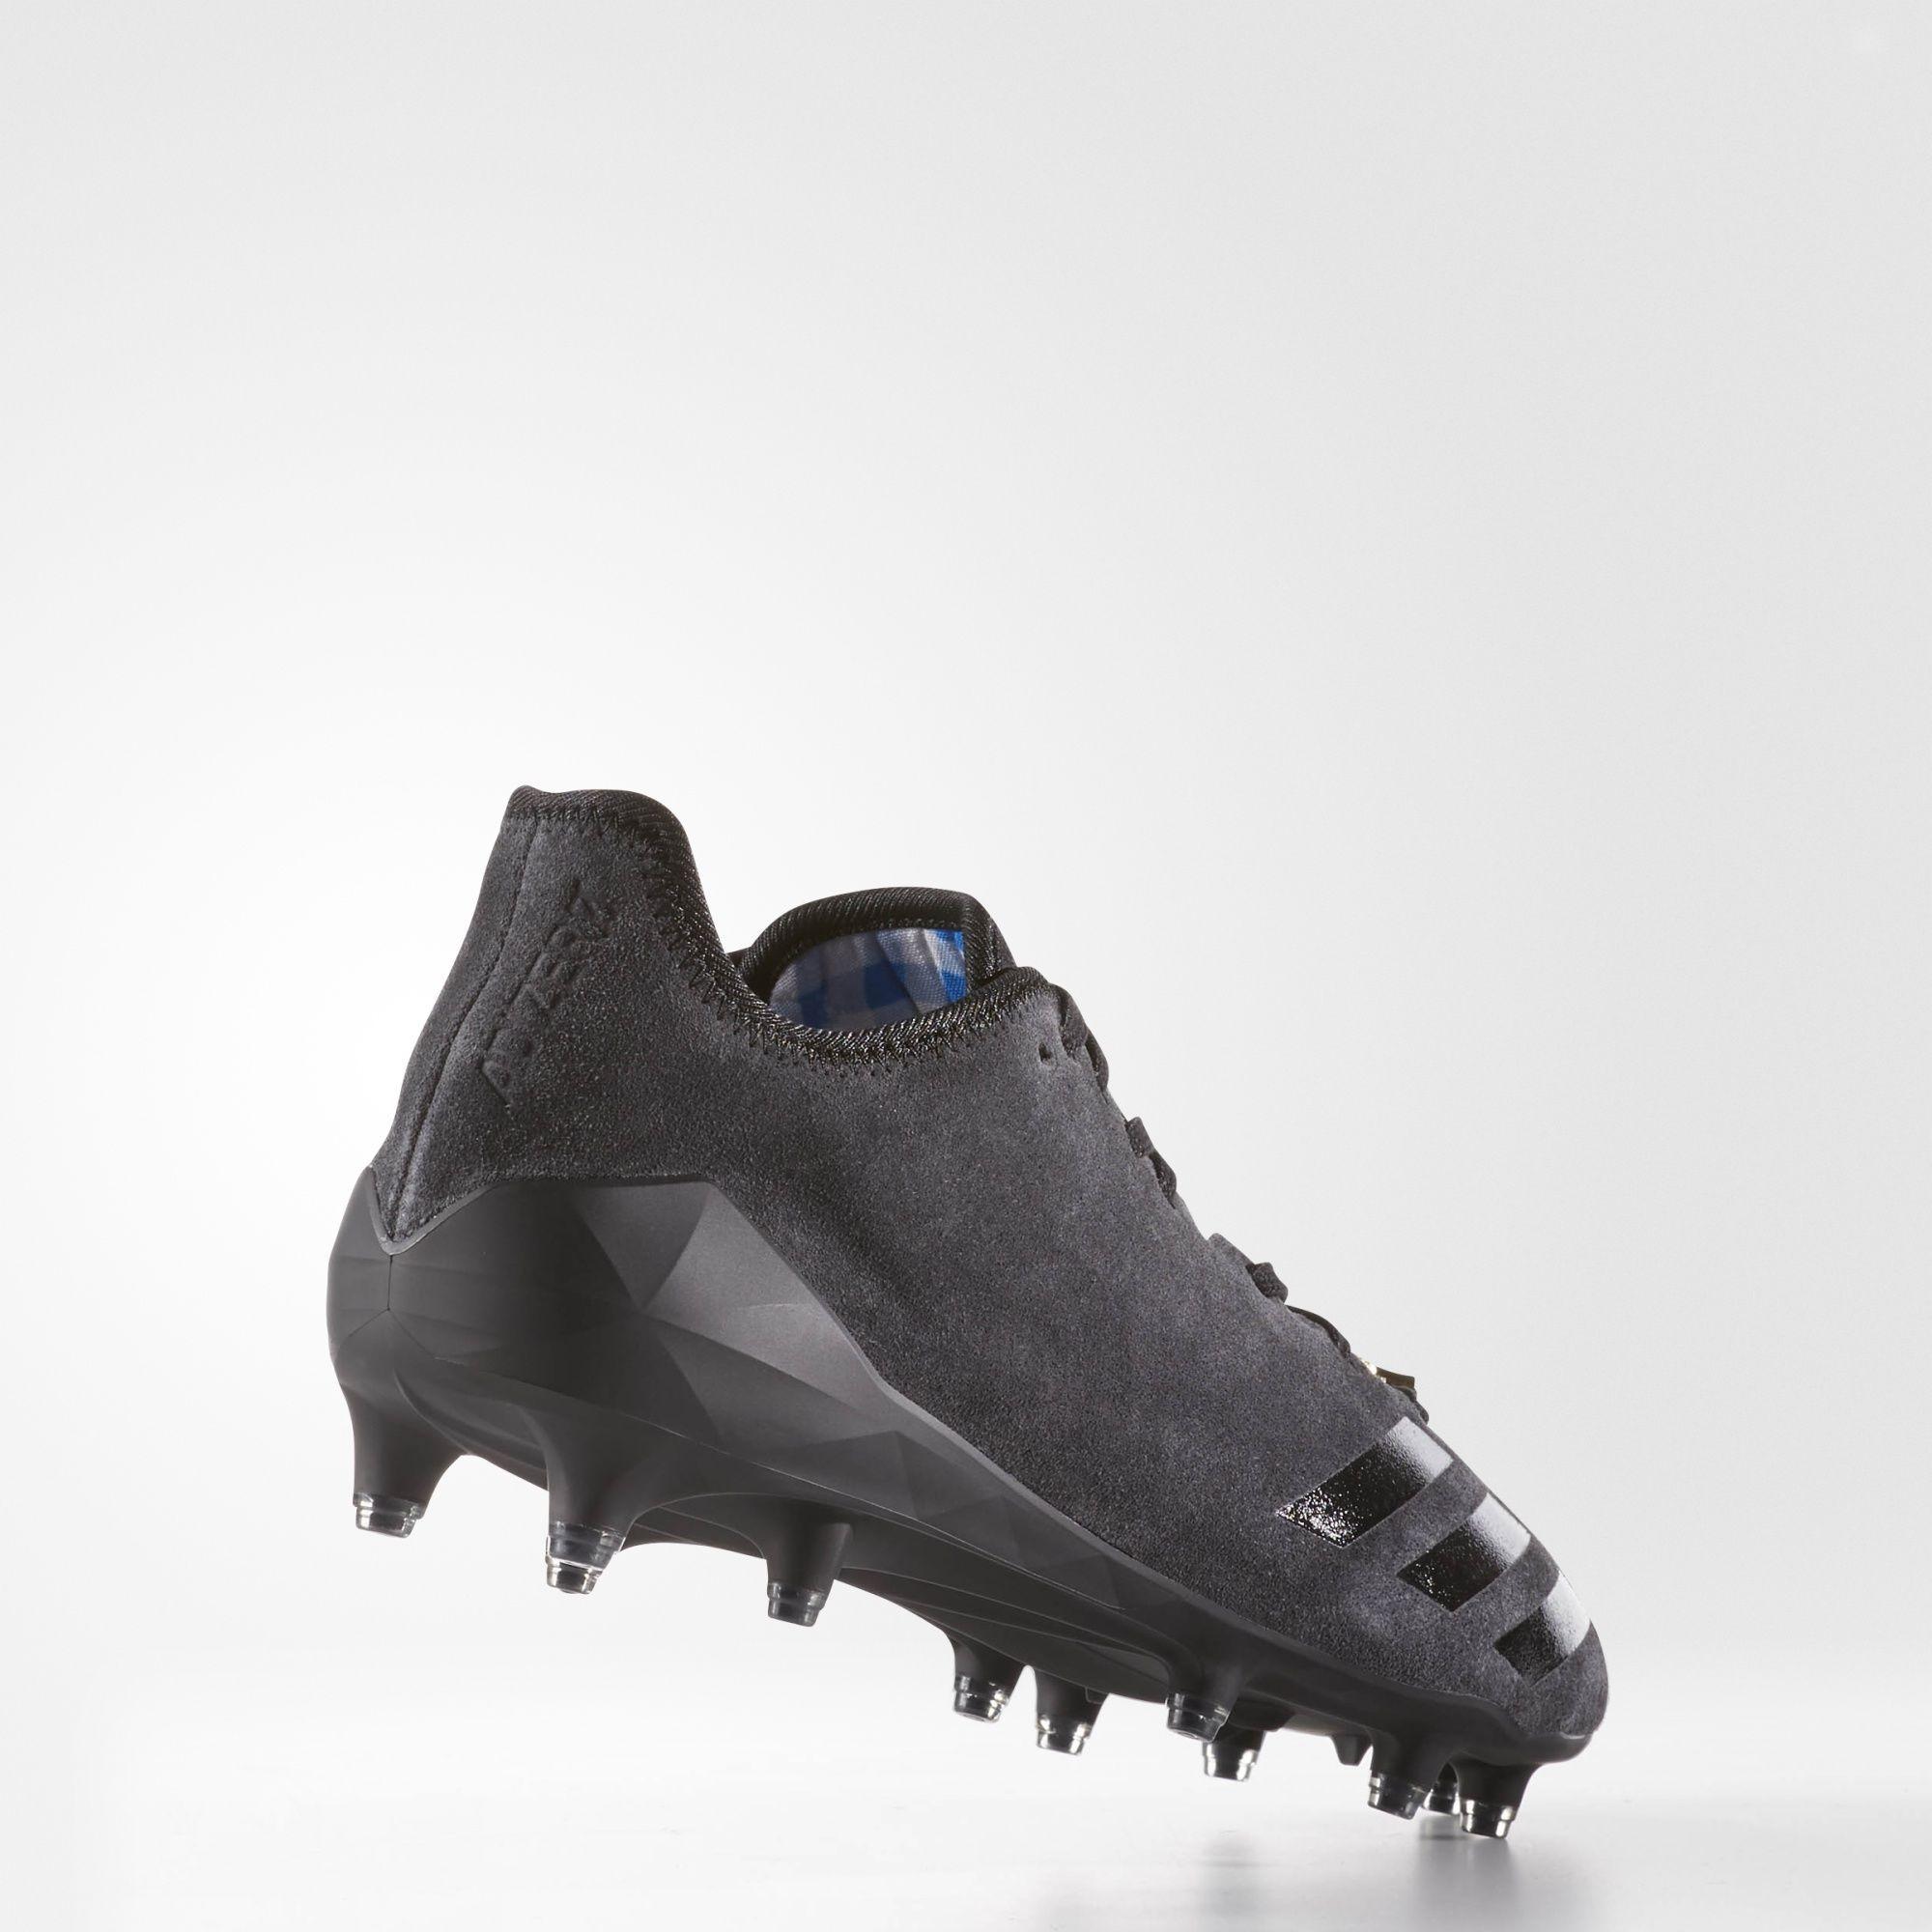 2afaa0456db adidas - adizero 5-Star 6.0 Sunday s Best Cleats